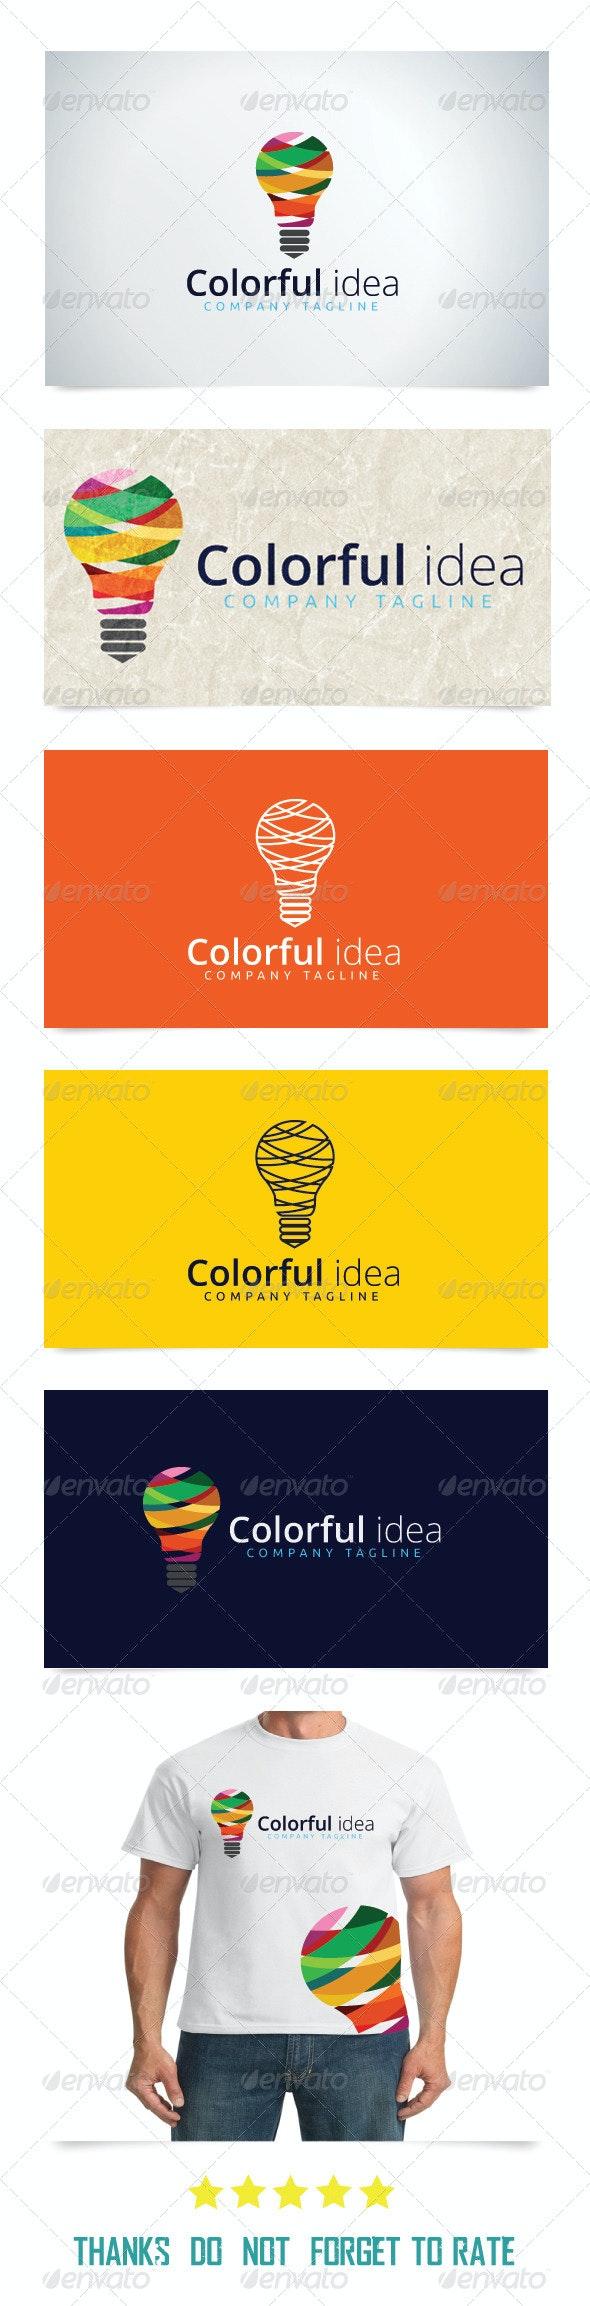 Colorful Idea  - Objects Logo Templates